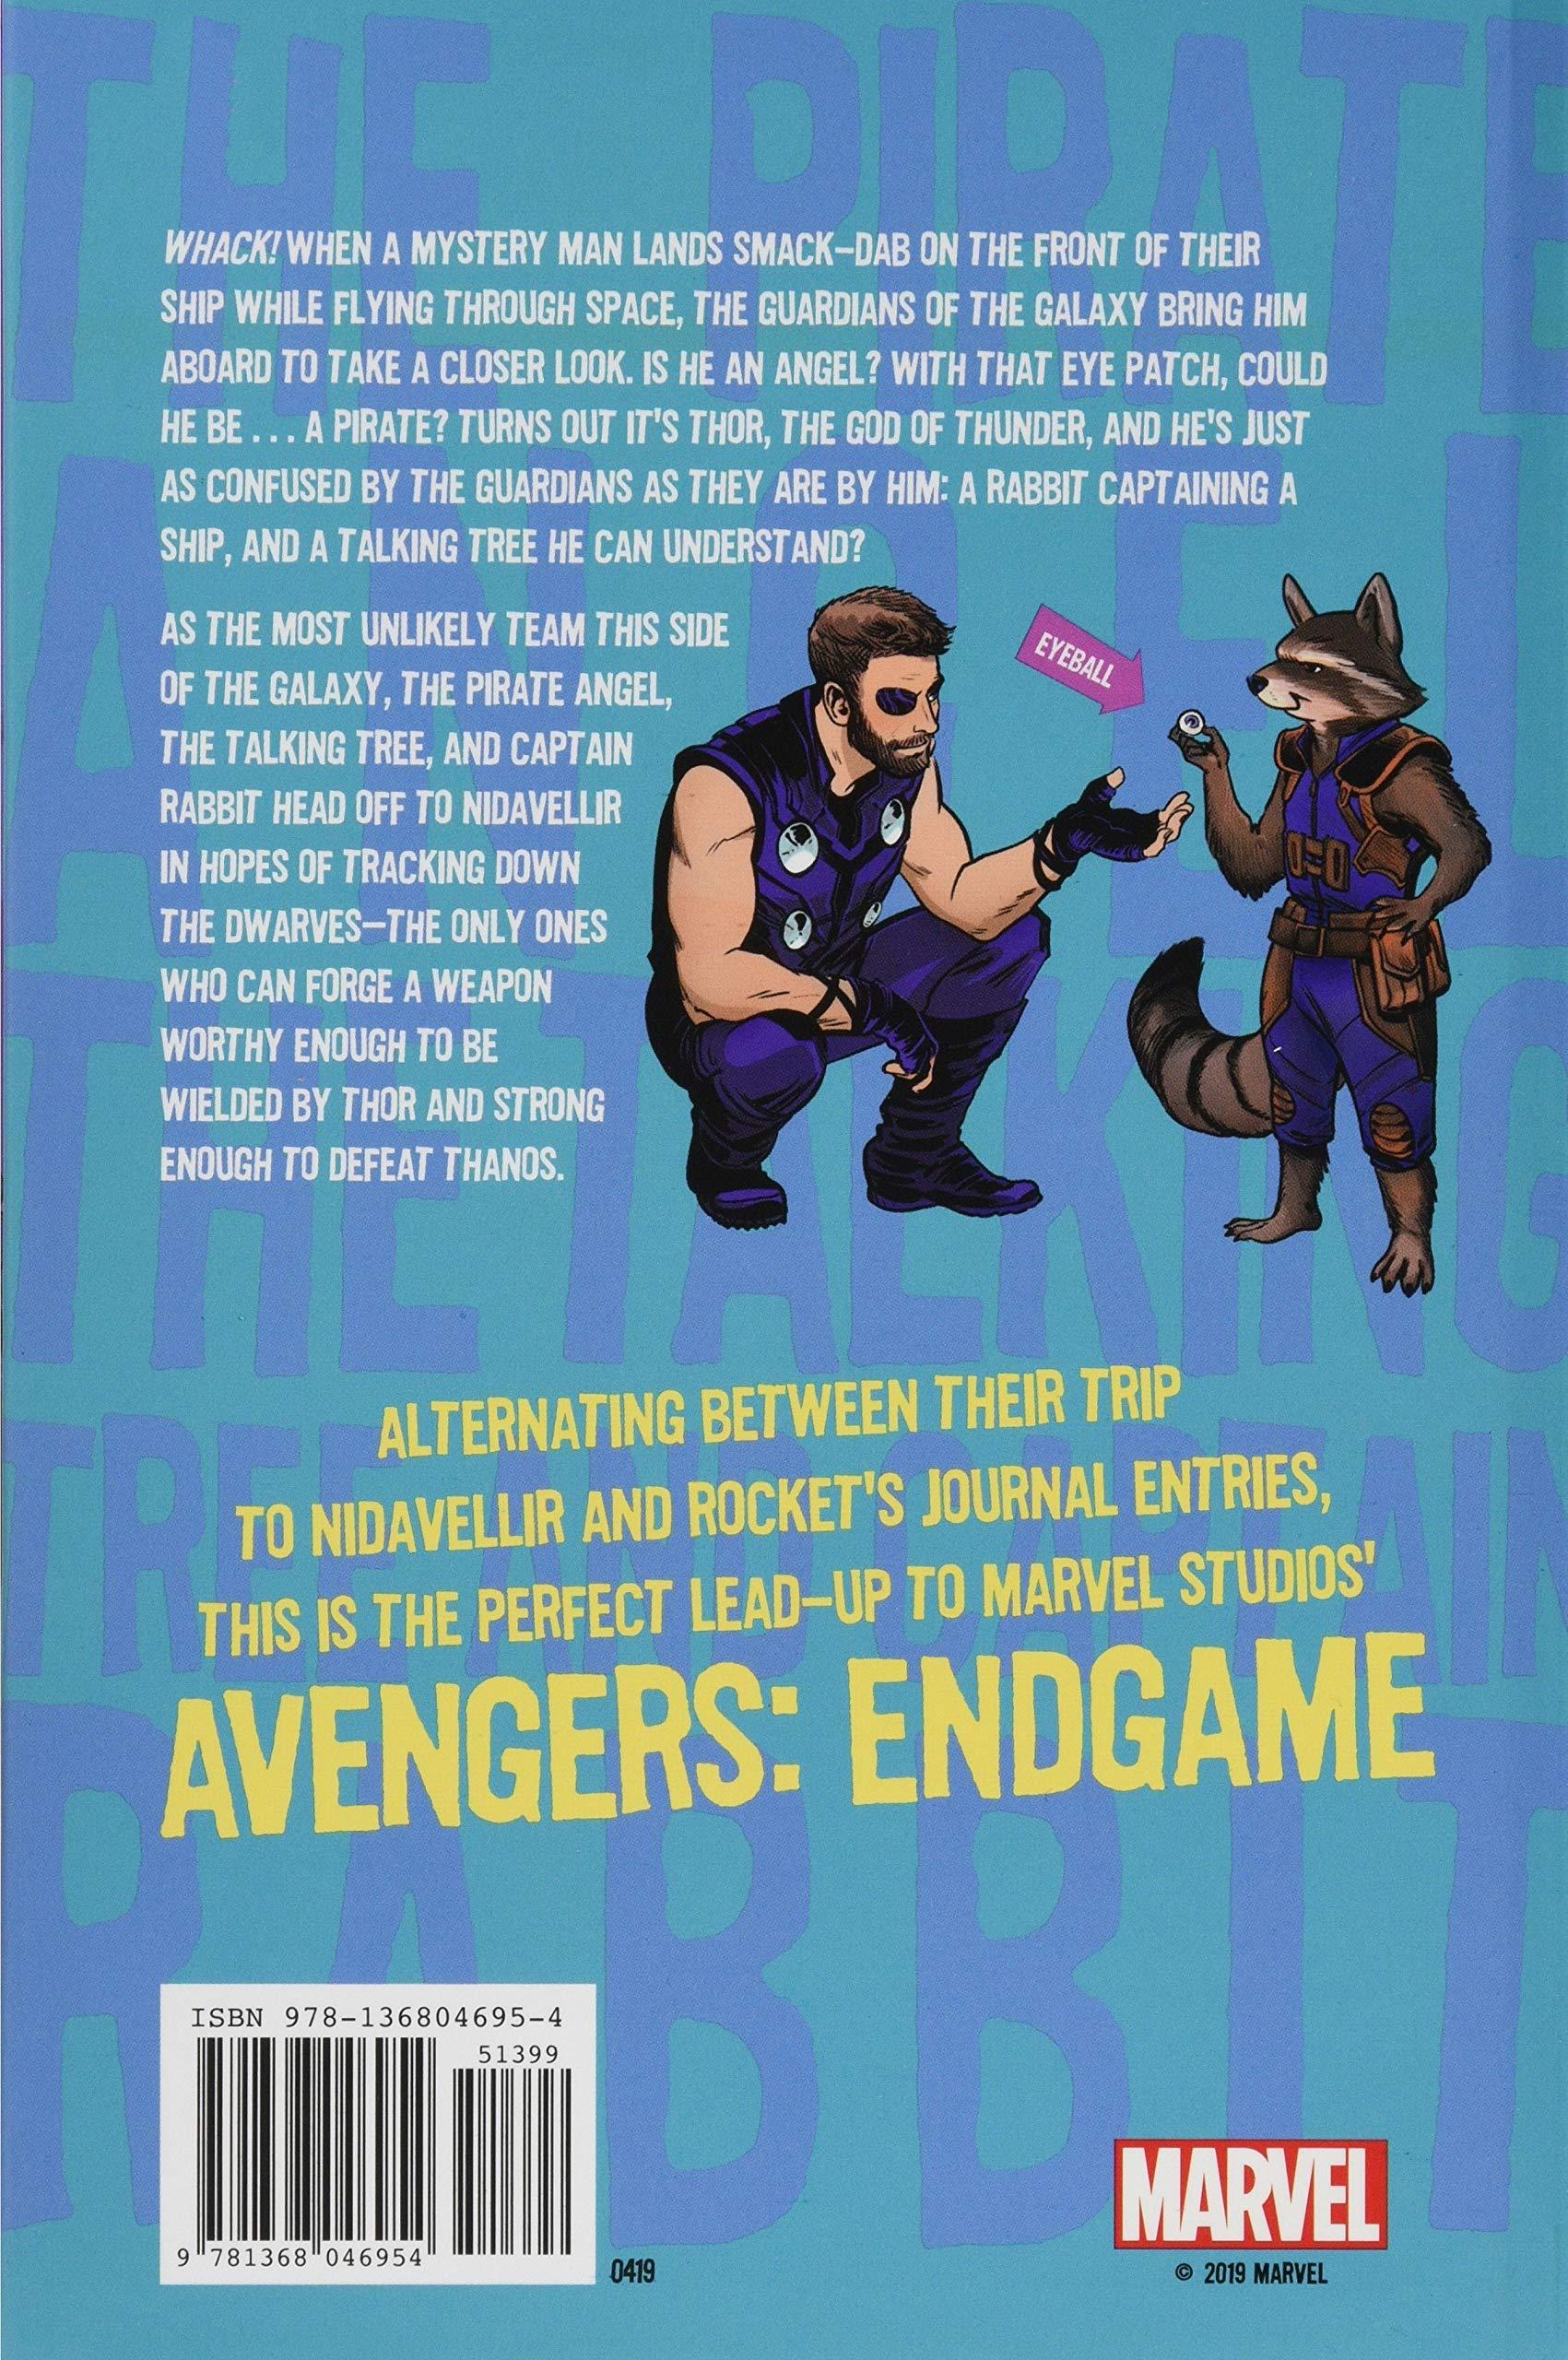 Amazon com: Avengers: Endgame The Pirate Angel, The Talking Tree